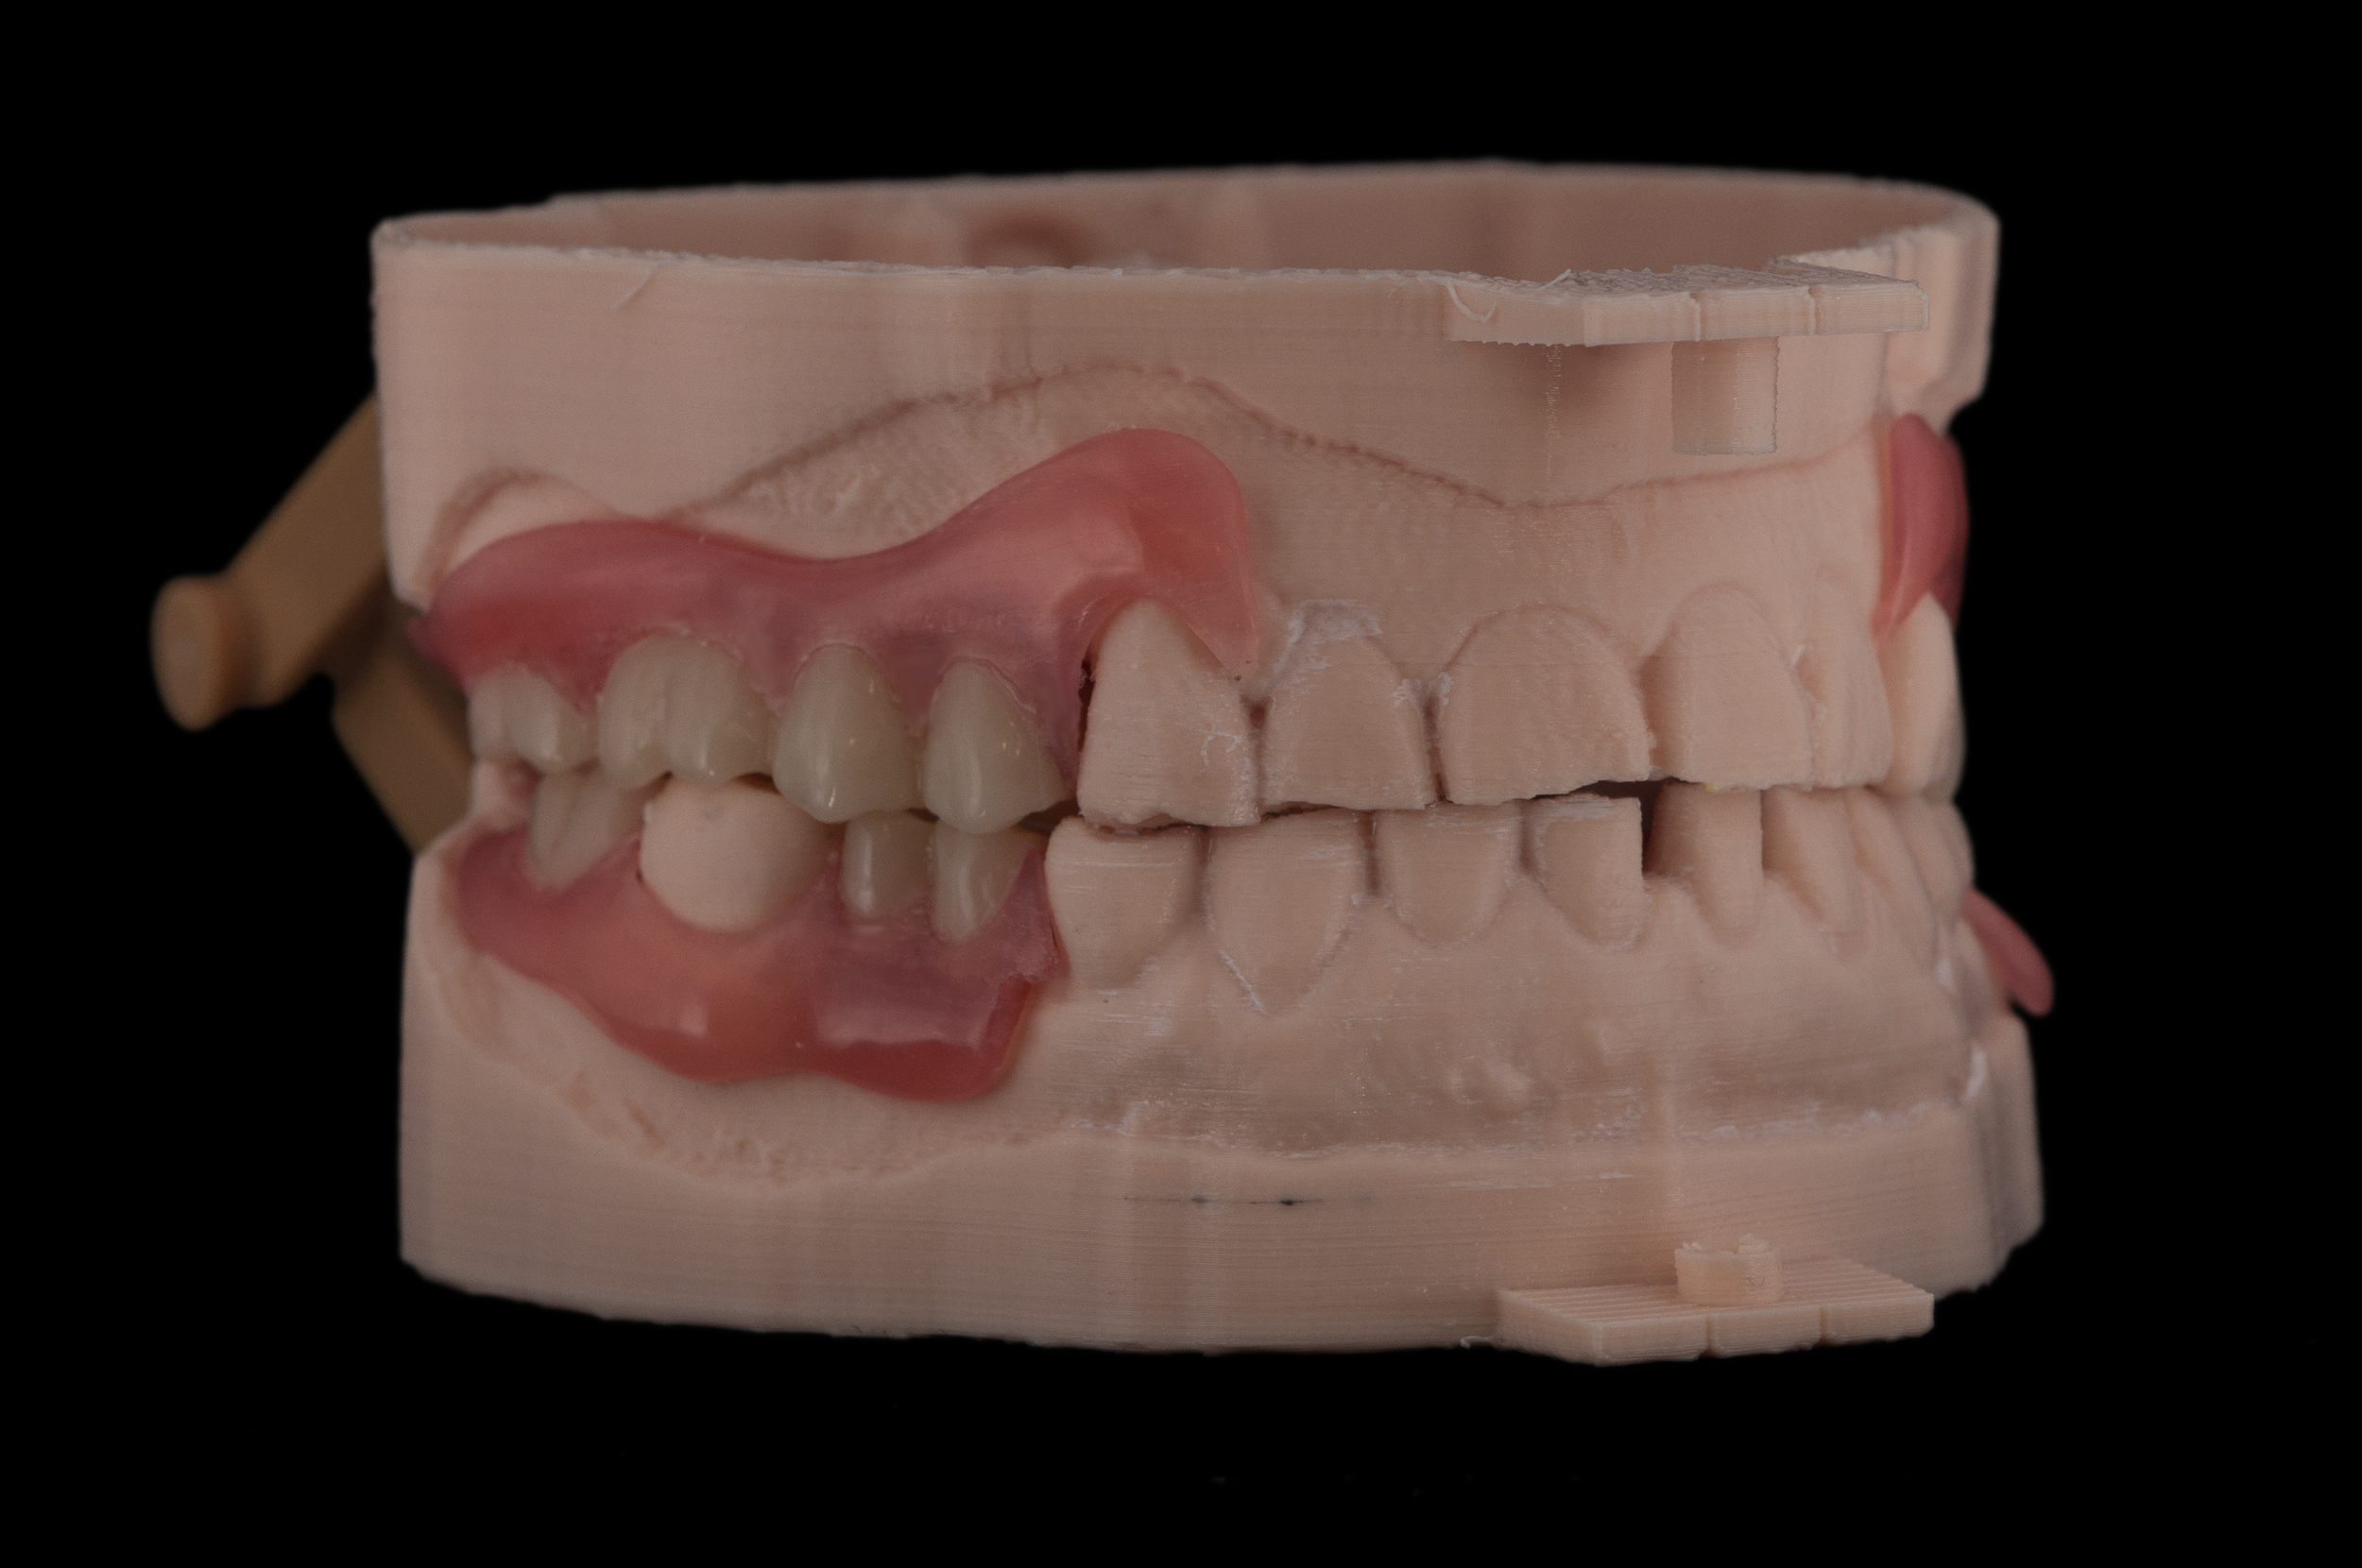 Valplast maxillary/mandibular partial dentures with milled PMMA denture teeth, printed on the r.Pod Desktop 3D Printer.